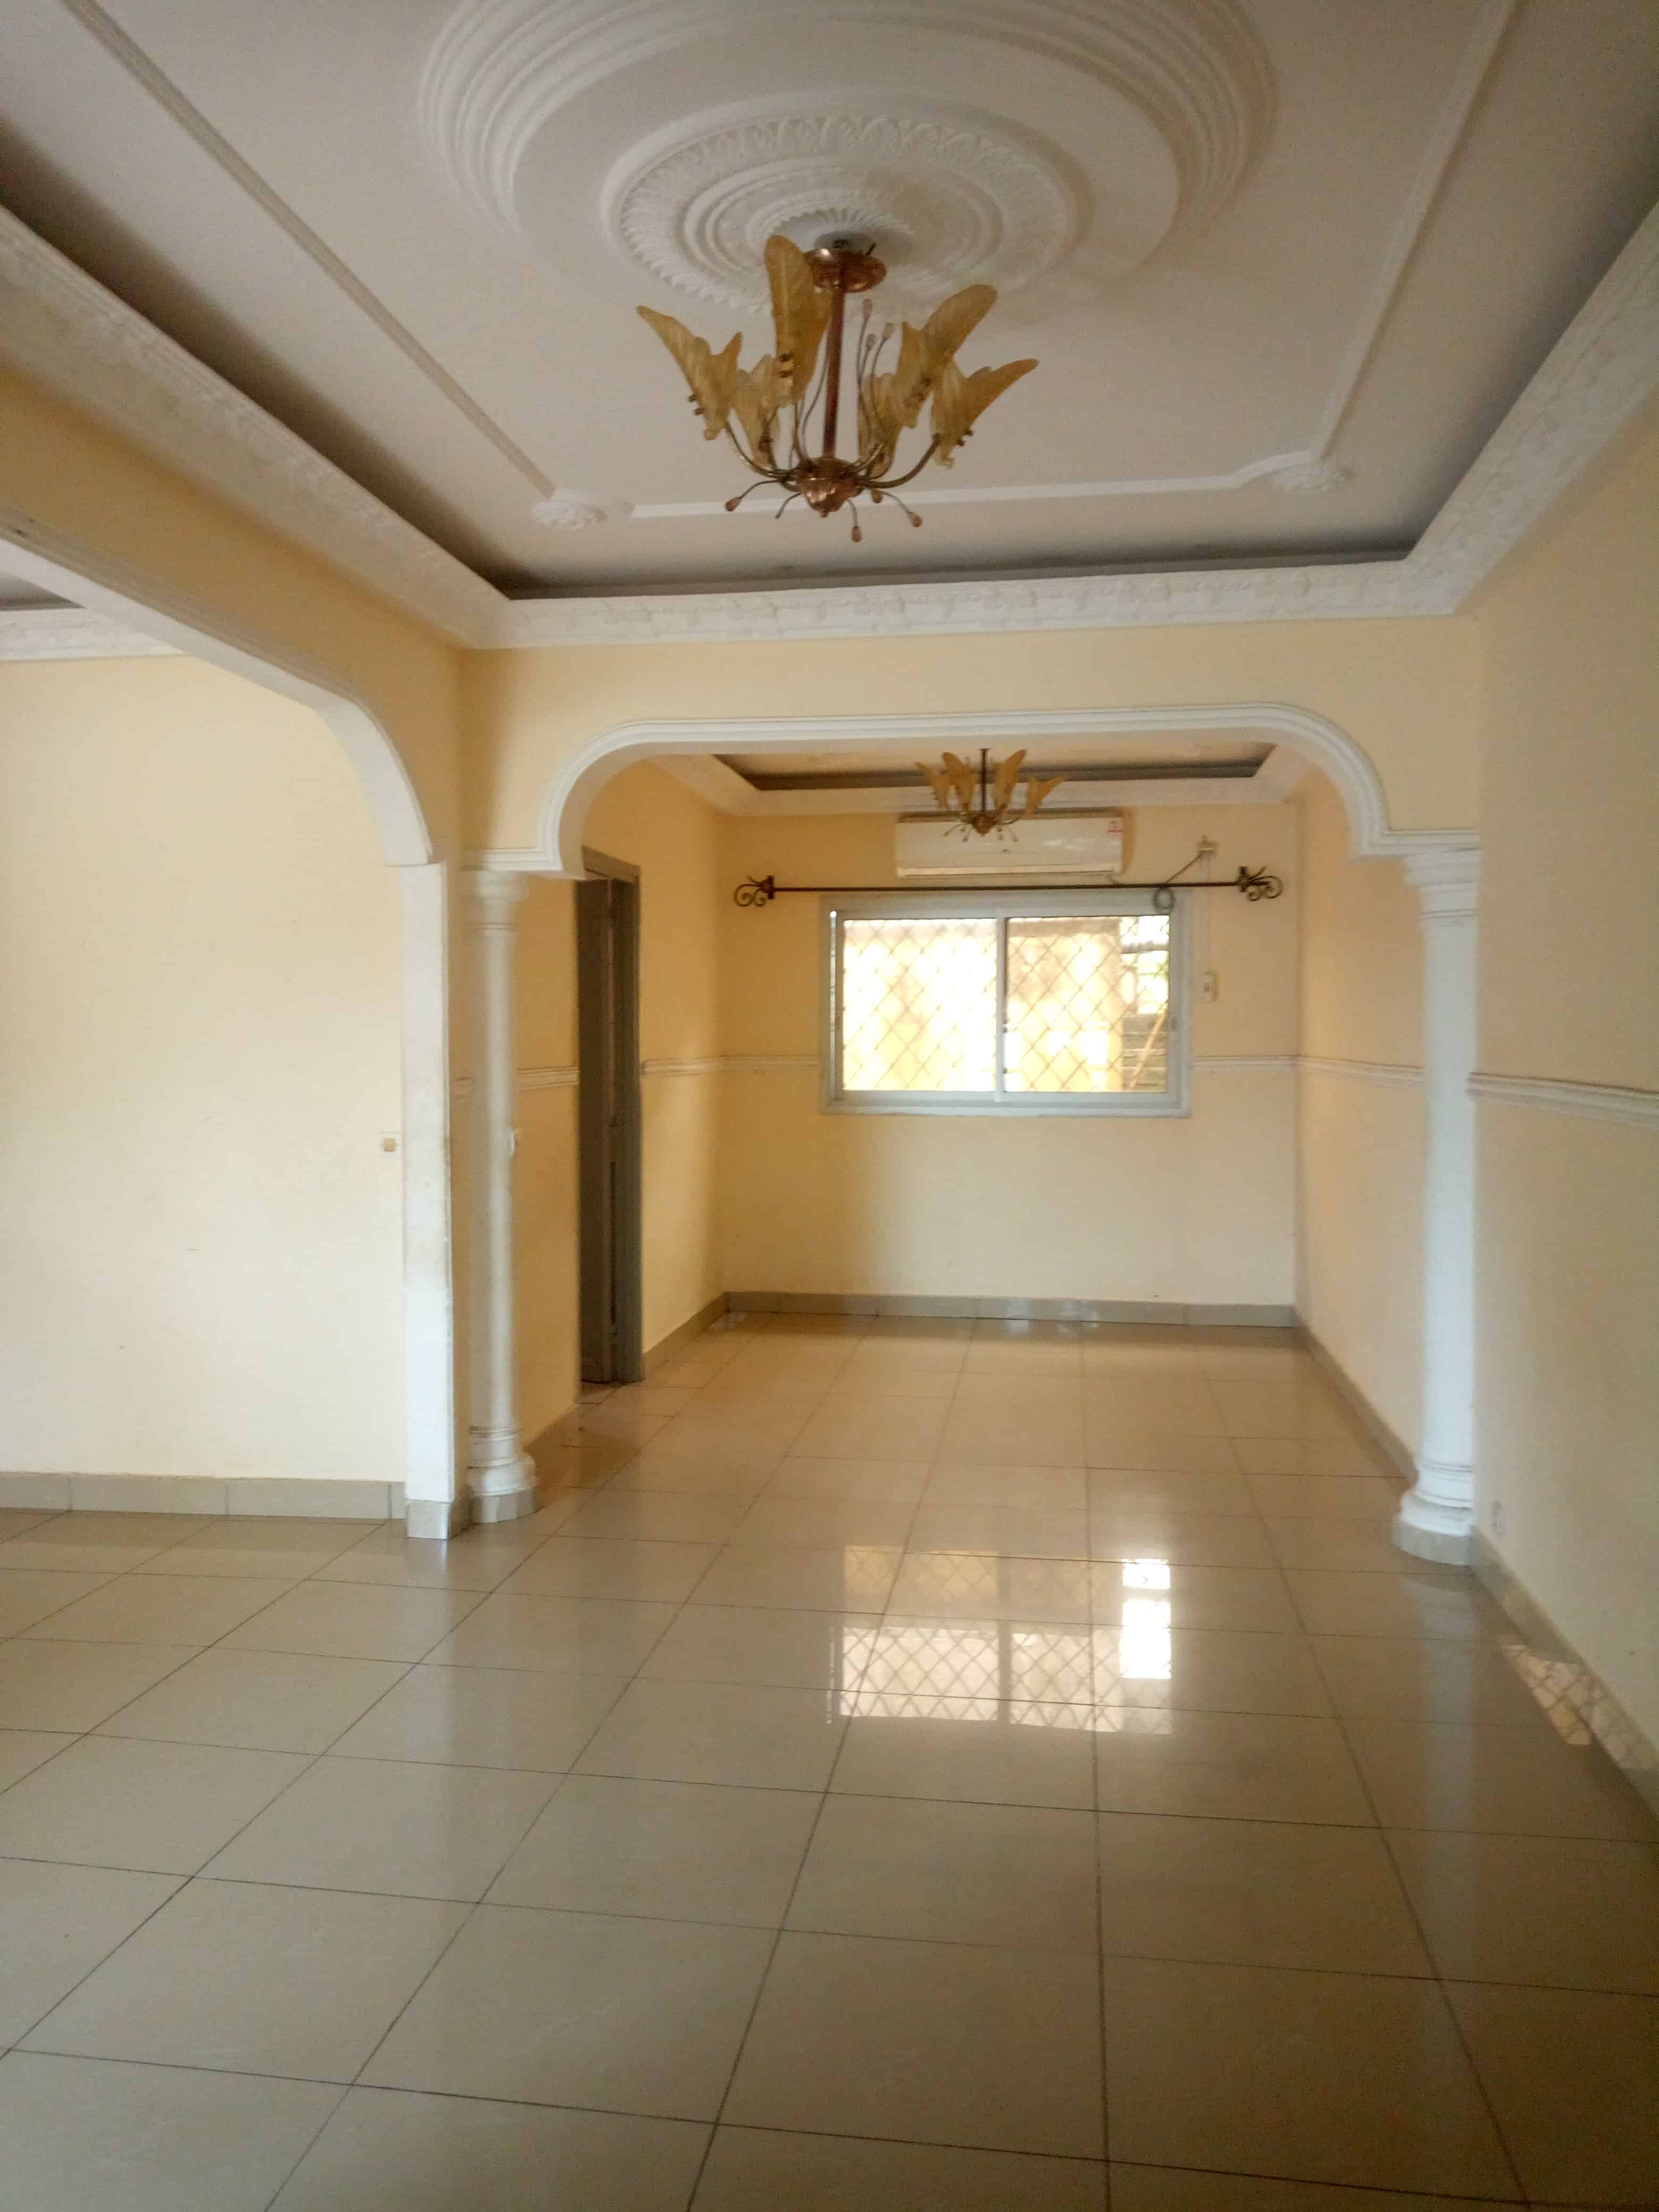 House (Villa) to rent - Douala, Makepe, Rond paulenc - 1 living room(s), 3 bedroom(s), 2 bathroom(s) - 200 000 FCFA / month